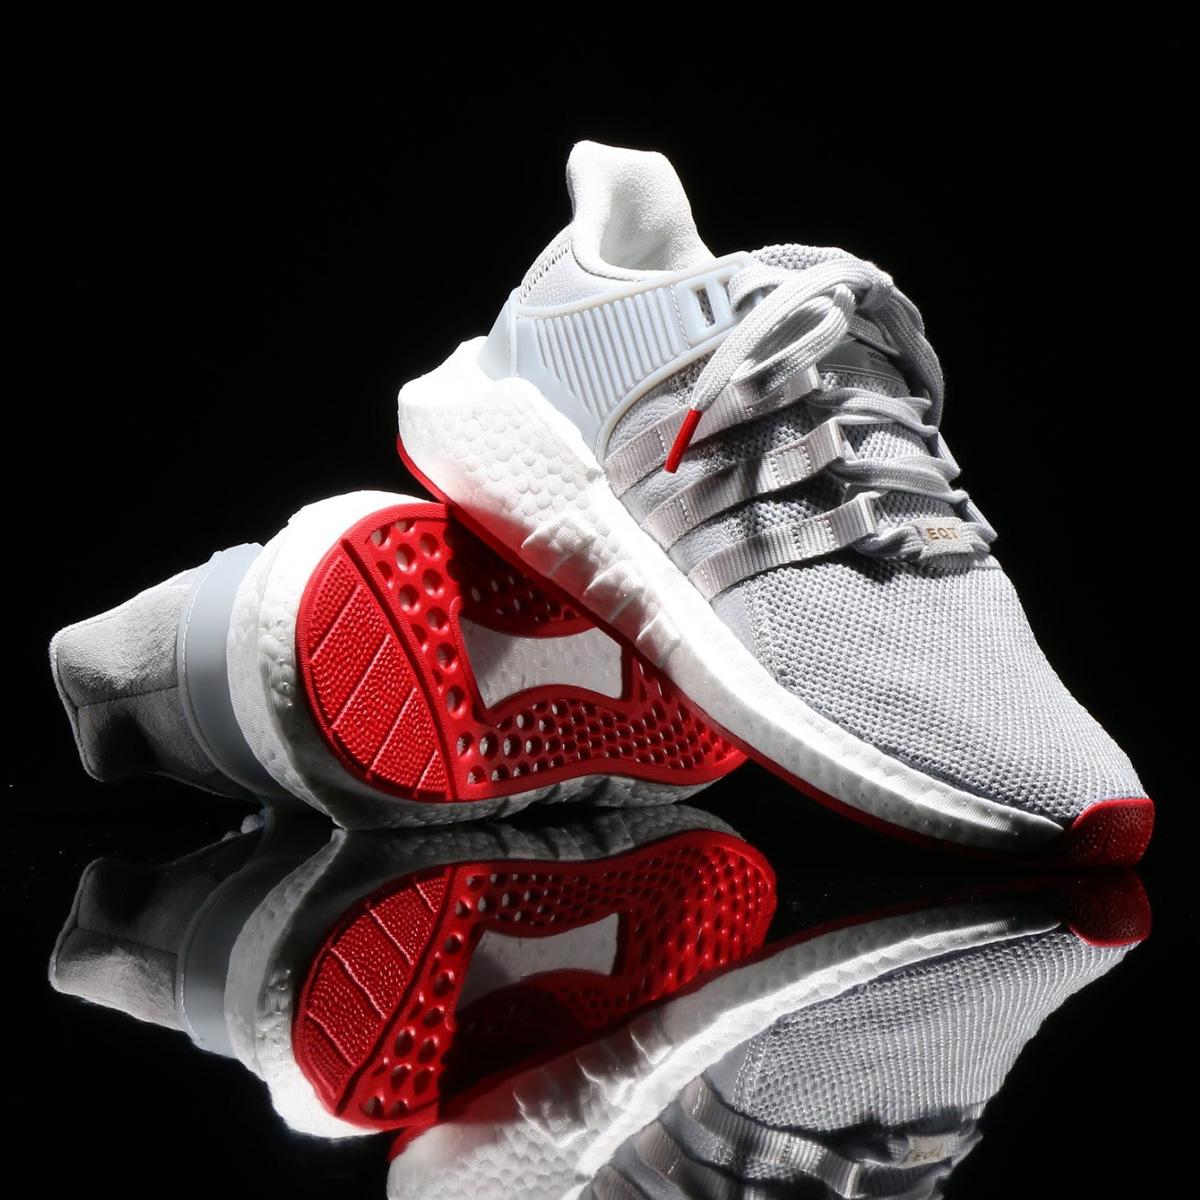 adidas Originals EQT SUPPORT 93/17(アディダス オリジナルス イーキューティー サポート 93/17)Matte Silver/Matte Silver / Running White【メンズ スニーカー】18SS-S